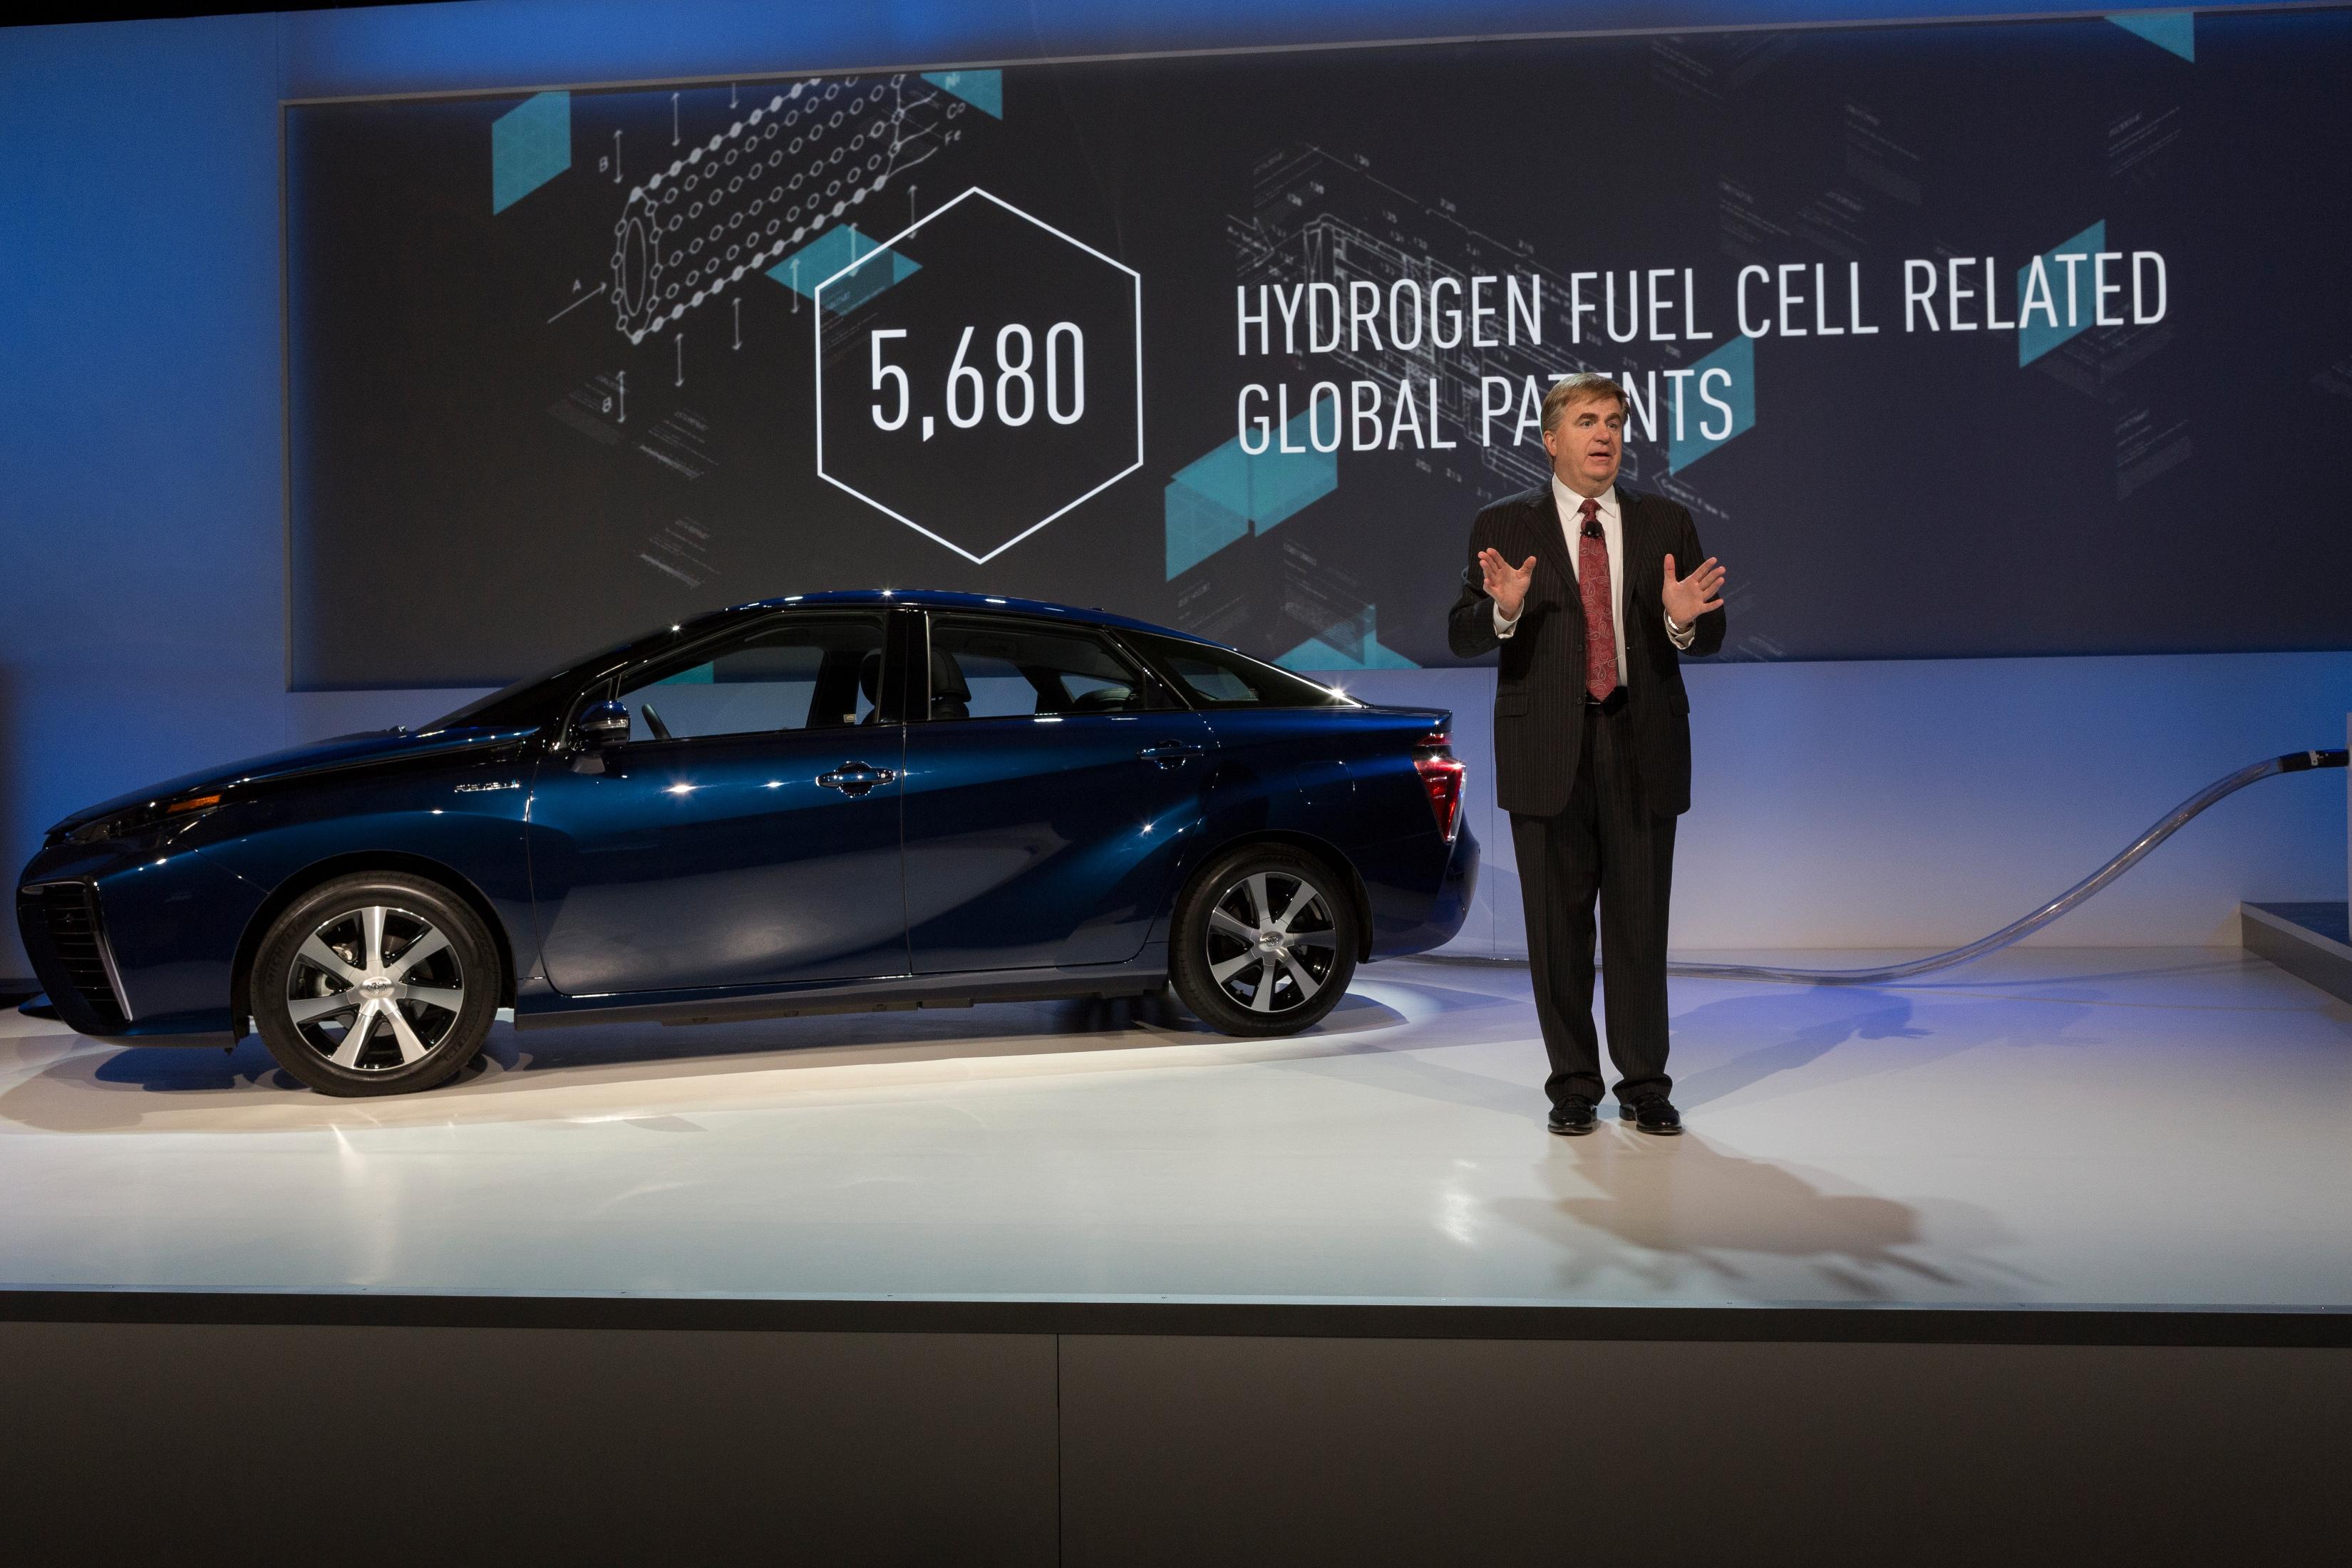 Toyota libera 5.680 patentes